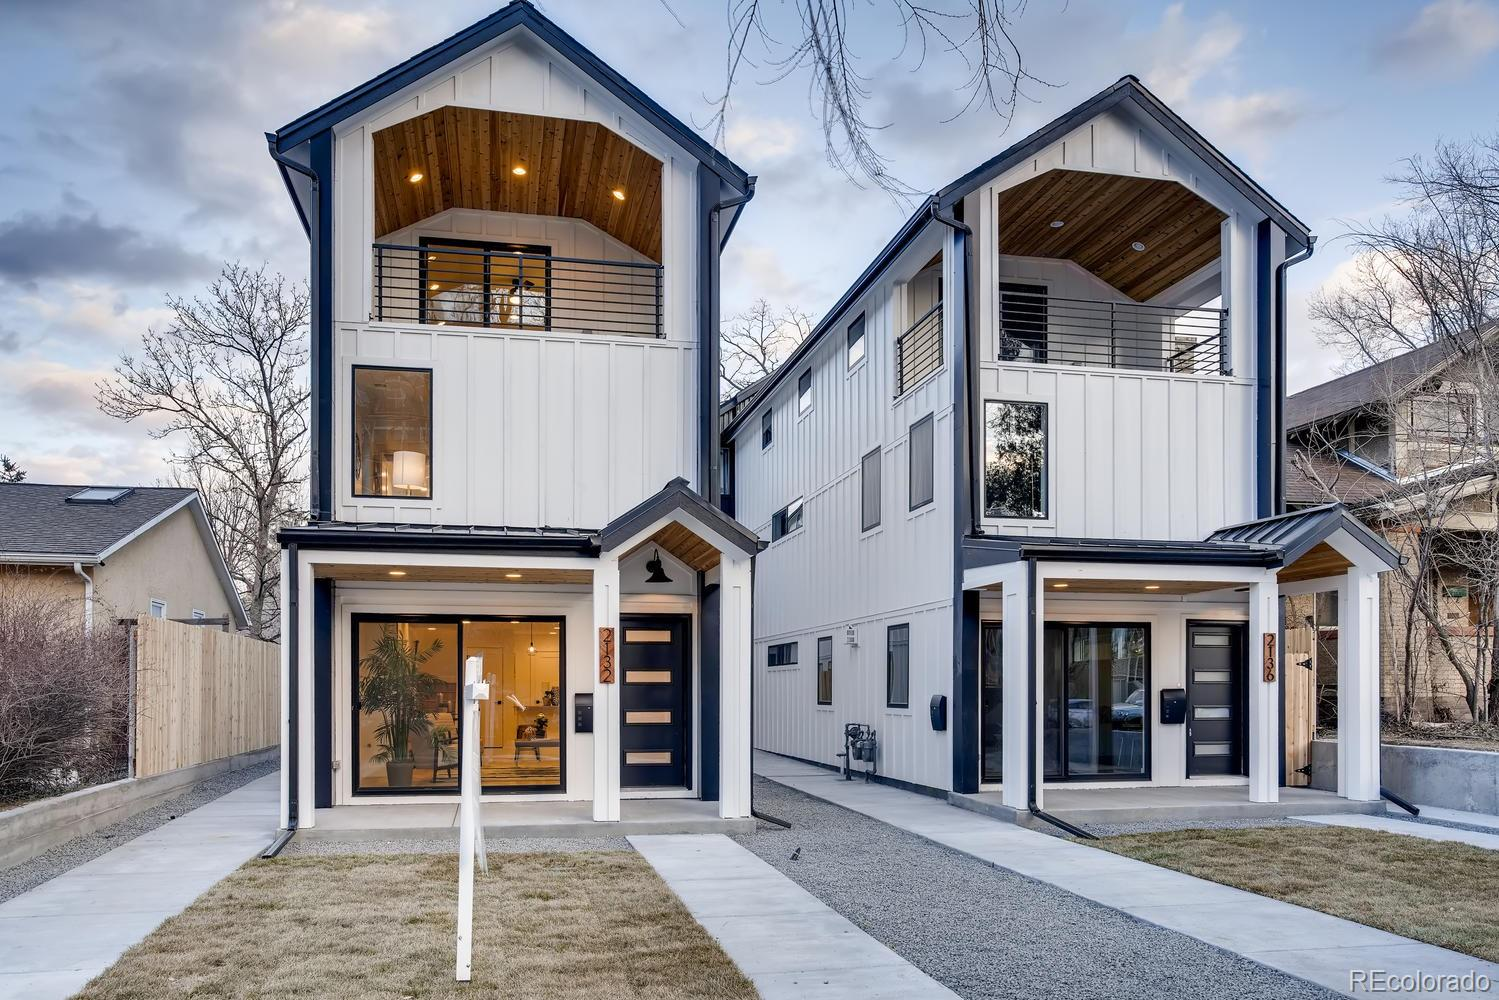 2130 S Josephine Property Photo - Denver, CO real estate listing